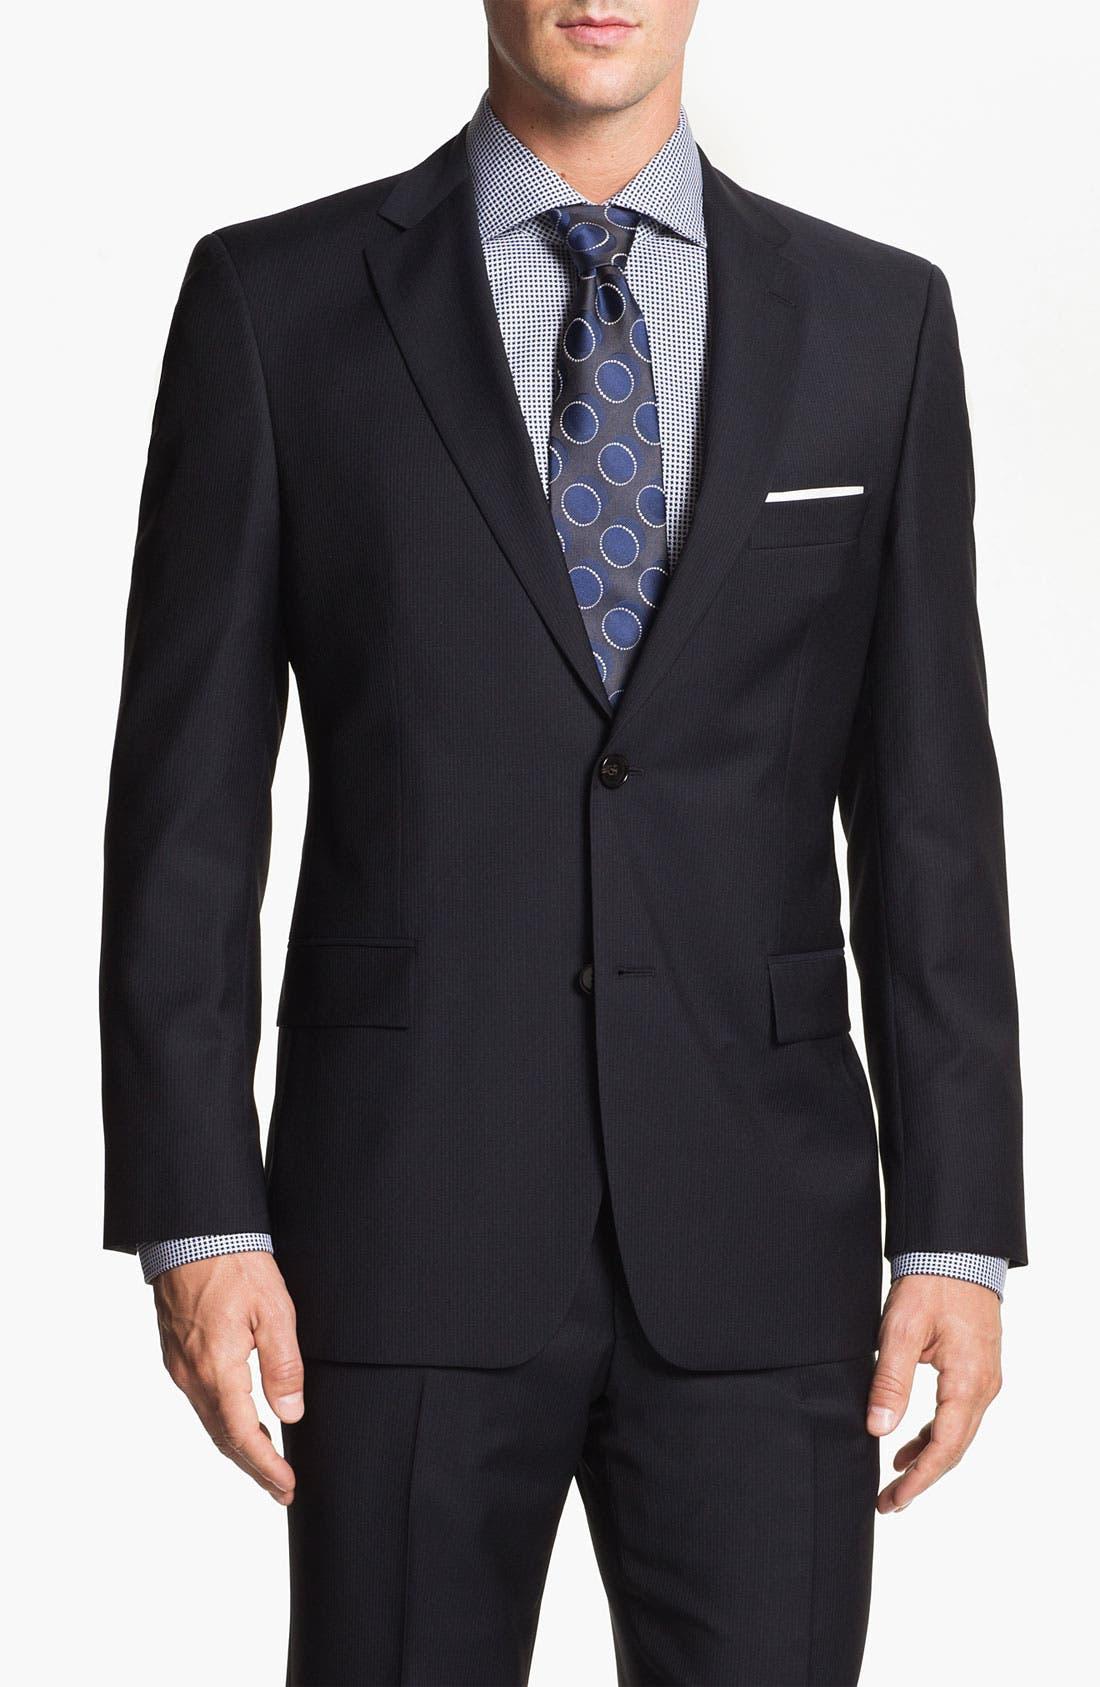 Alternate Image 1 Selected - BOSS Black 'Pasolini/Movie' Stripe Suit